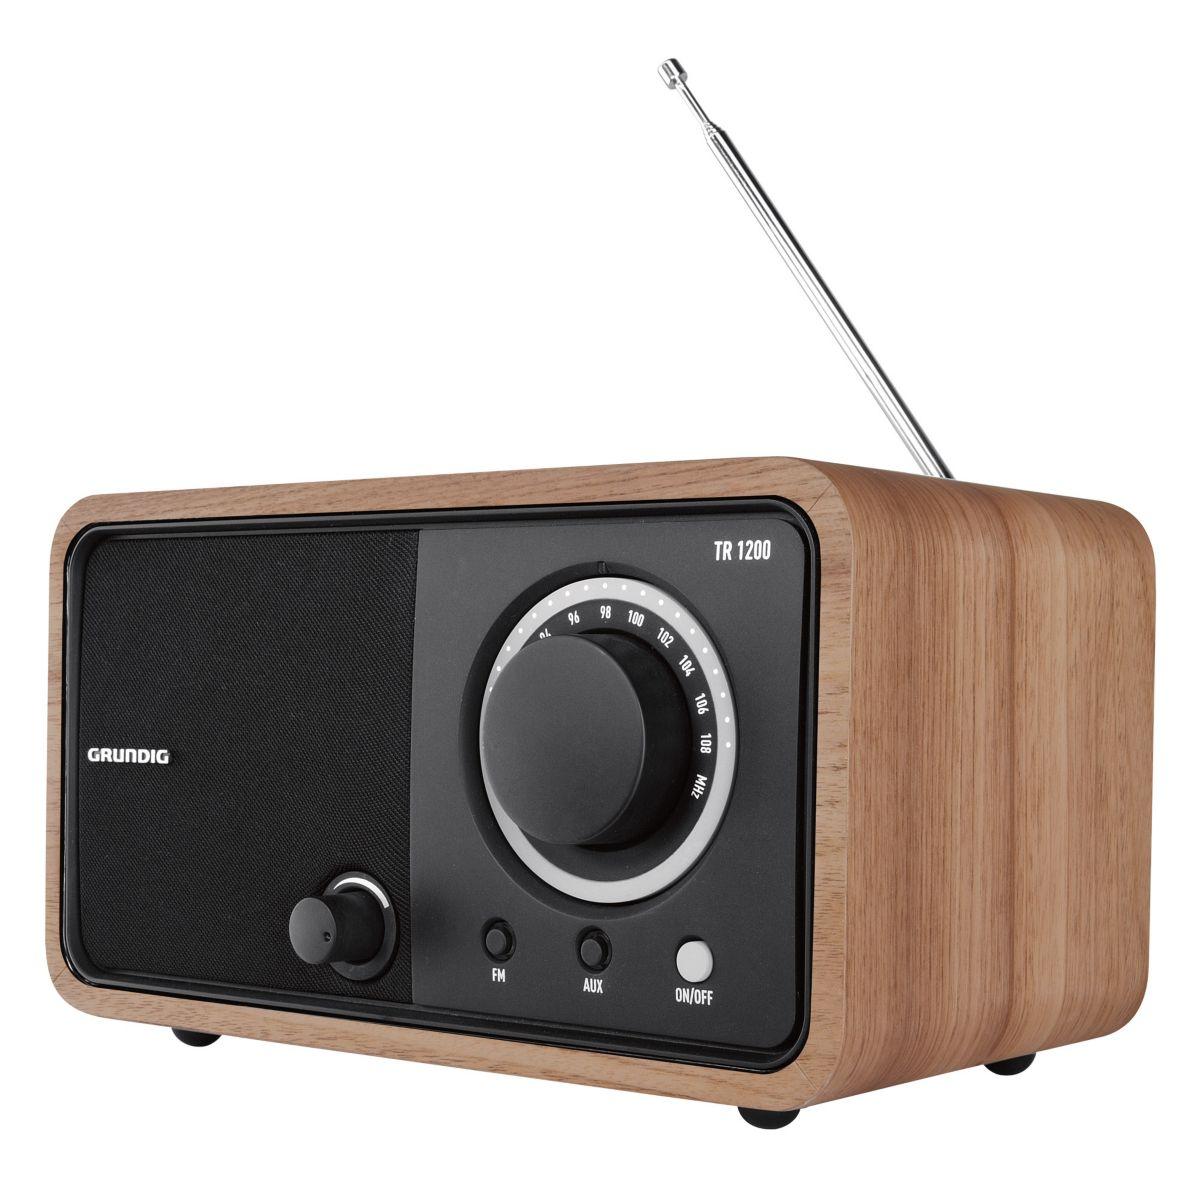 Radio analogique GRUNDIG TR 1200 Chêne